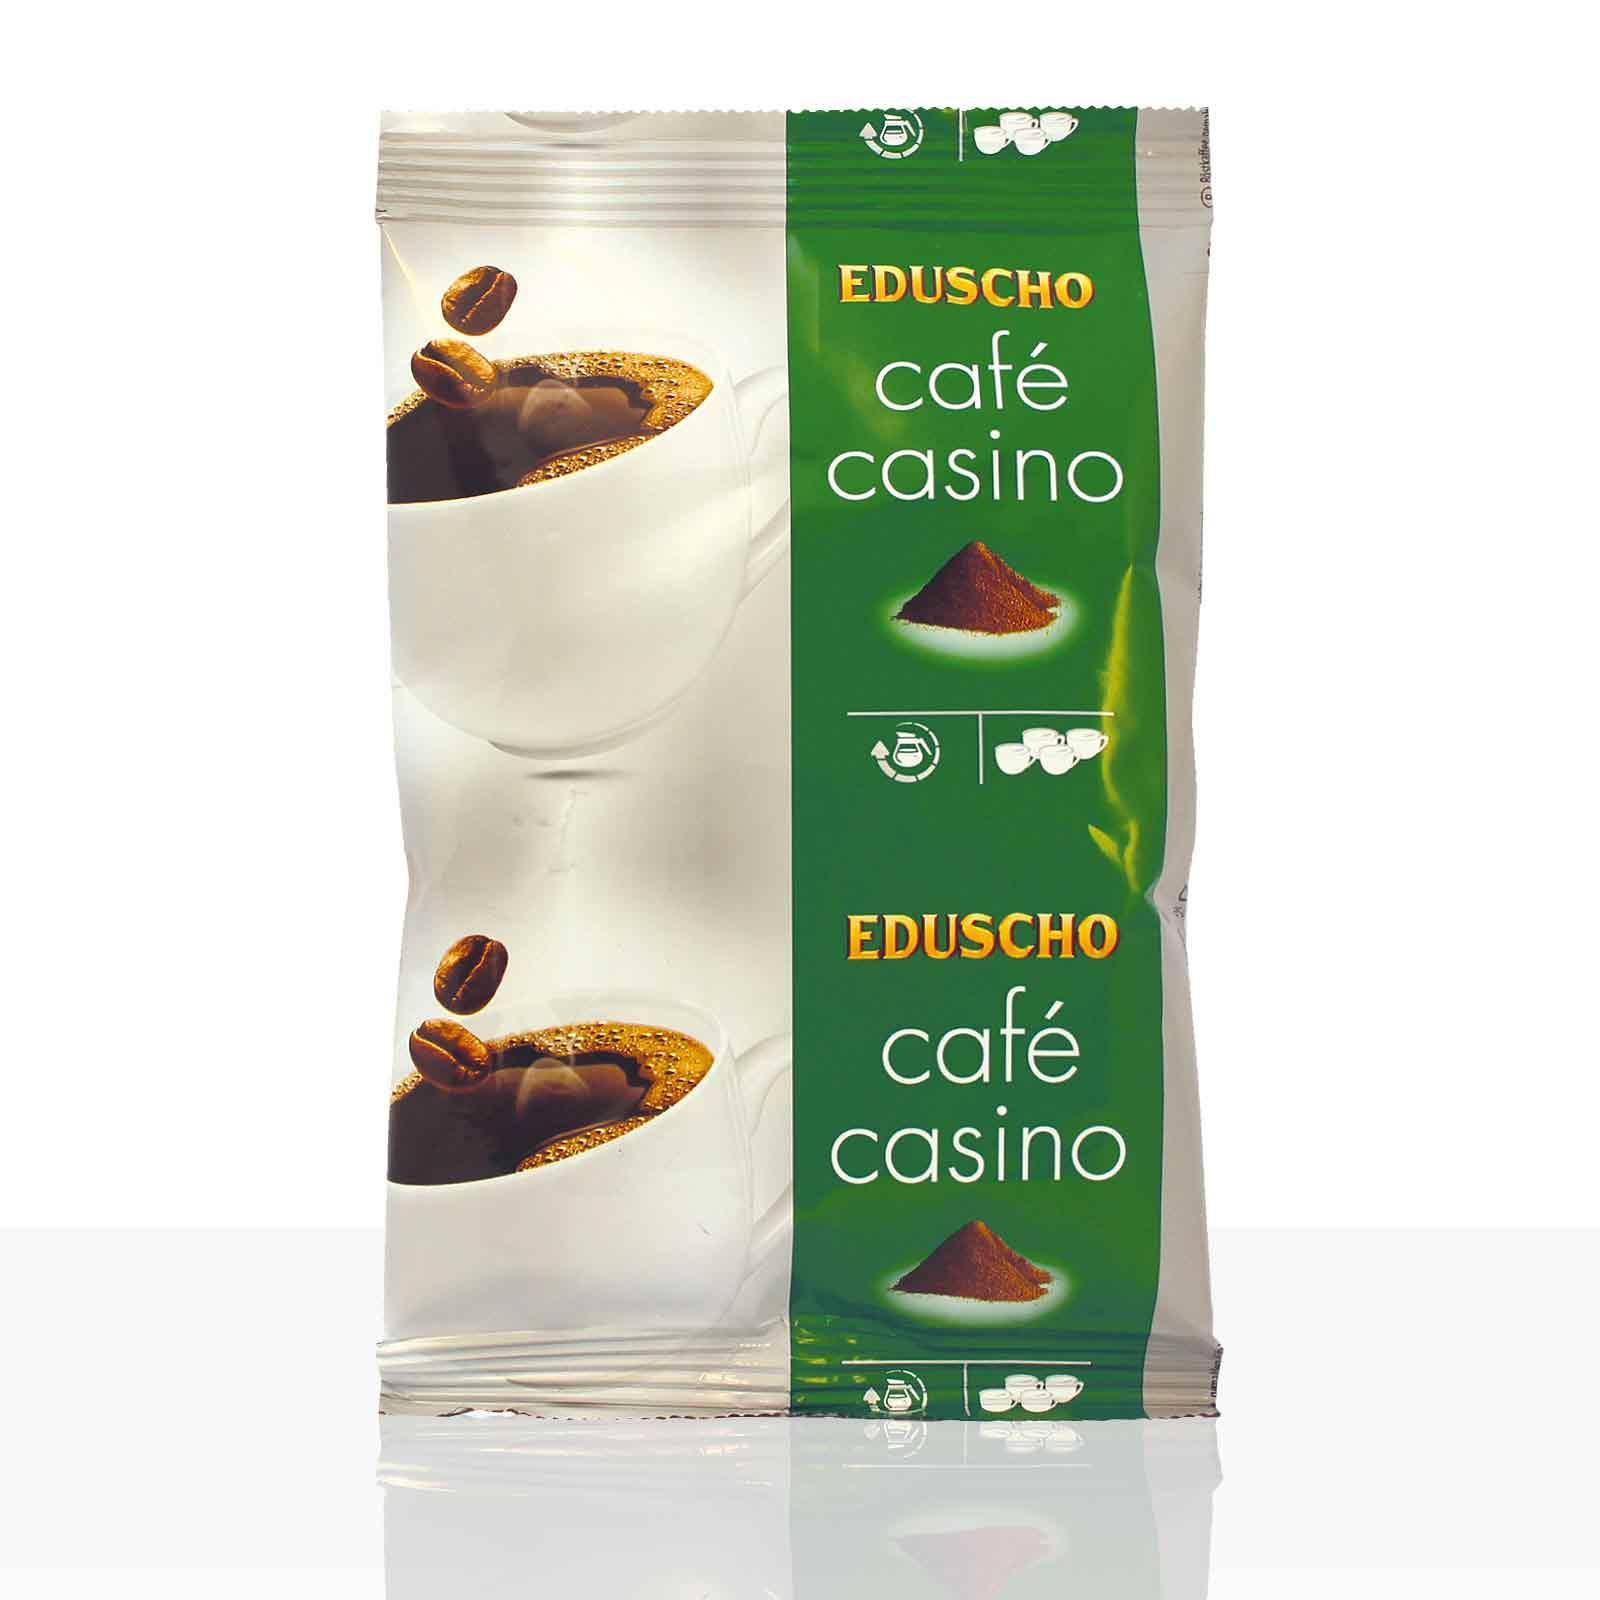 Tchibo / Eduscho Cafe Casino kräftig - 72 x 70g Kaffee gemahlen, Filterkaffee